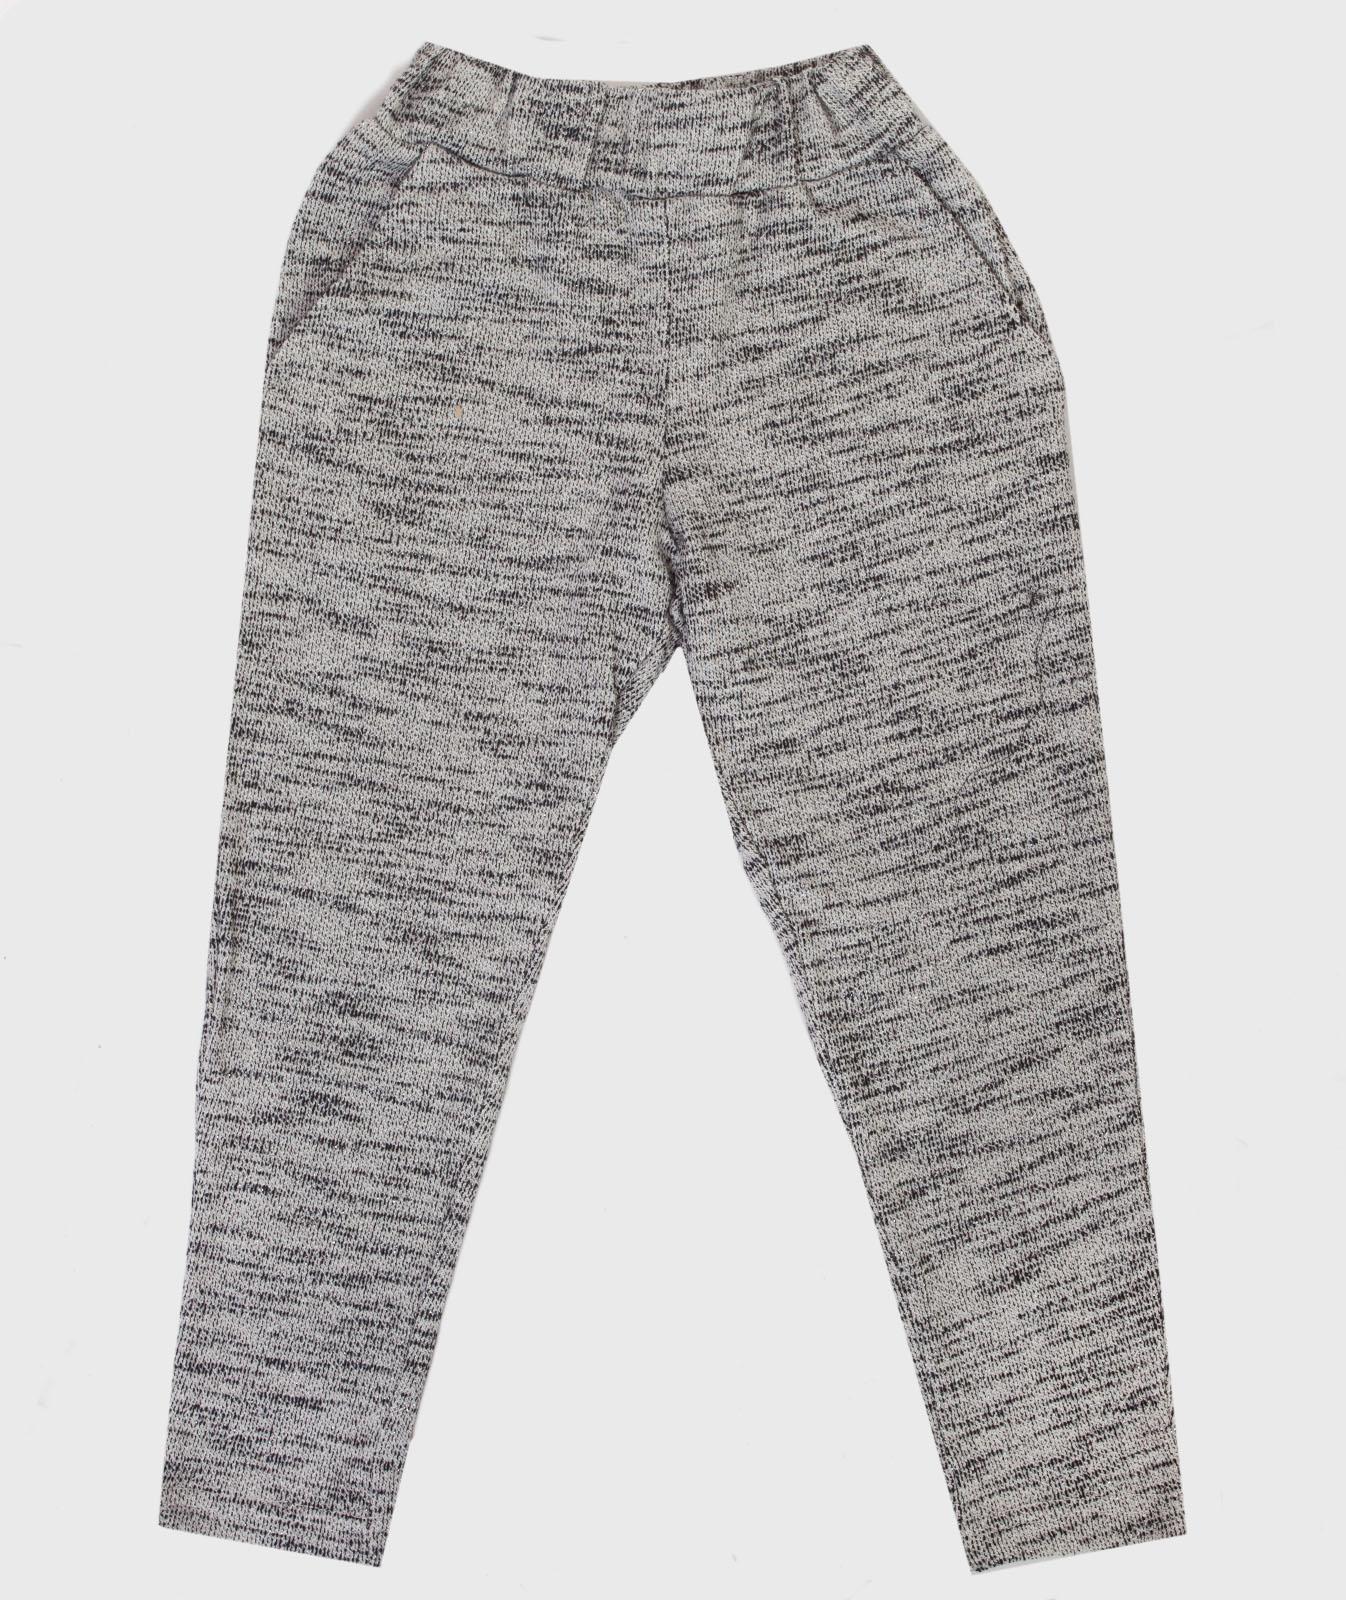 Детские брюки из меланжевого трикотажа.